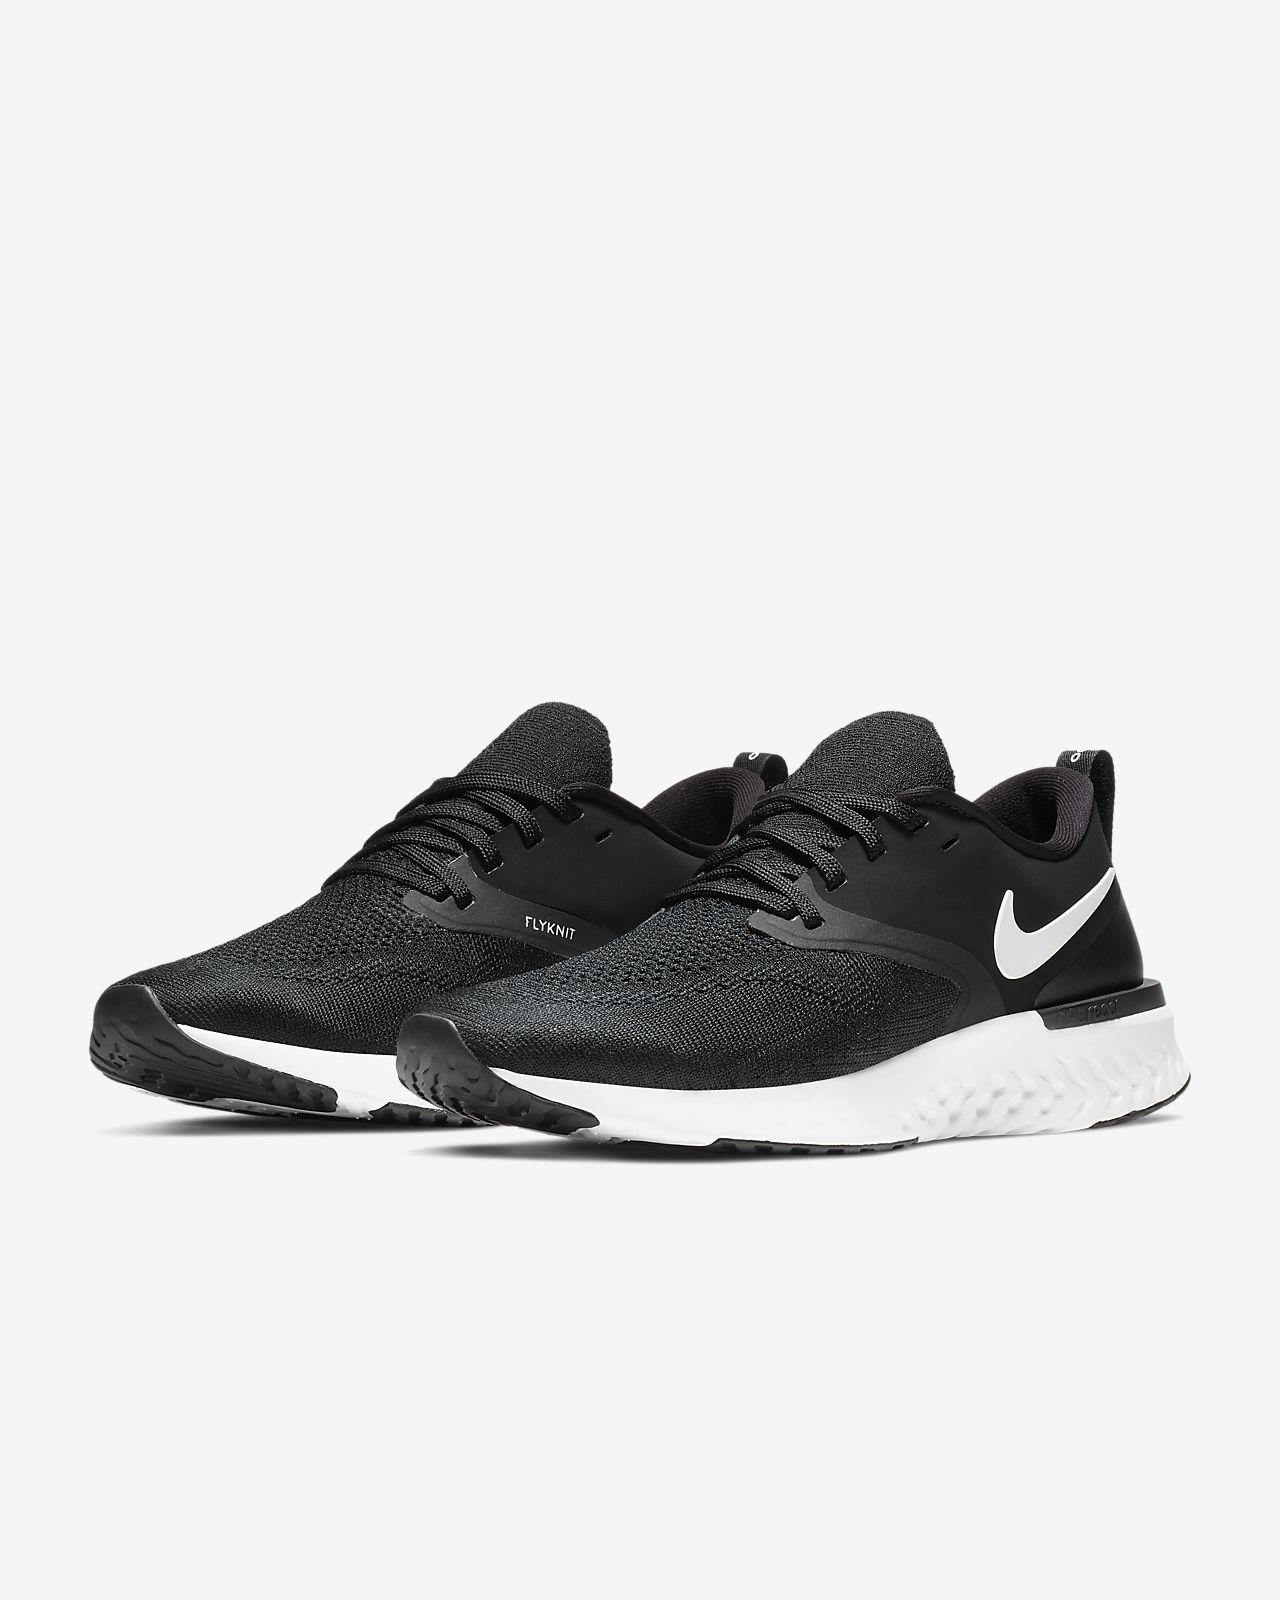 Nike Odyssey React Flyknit 2 Road Running Shoes Men's